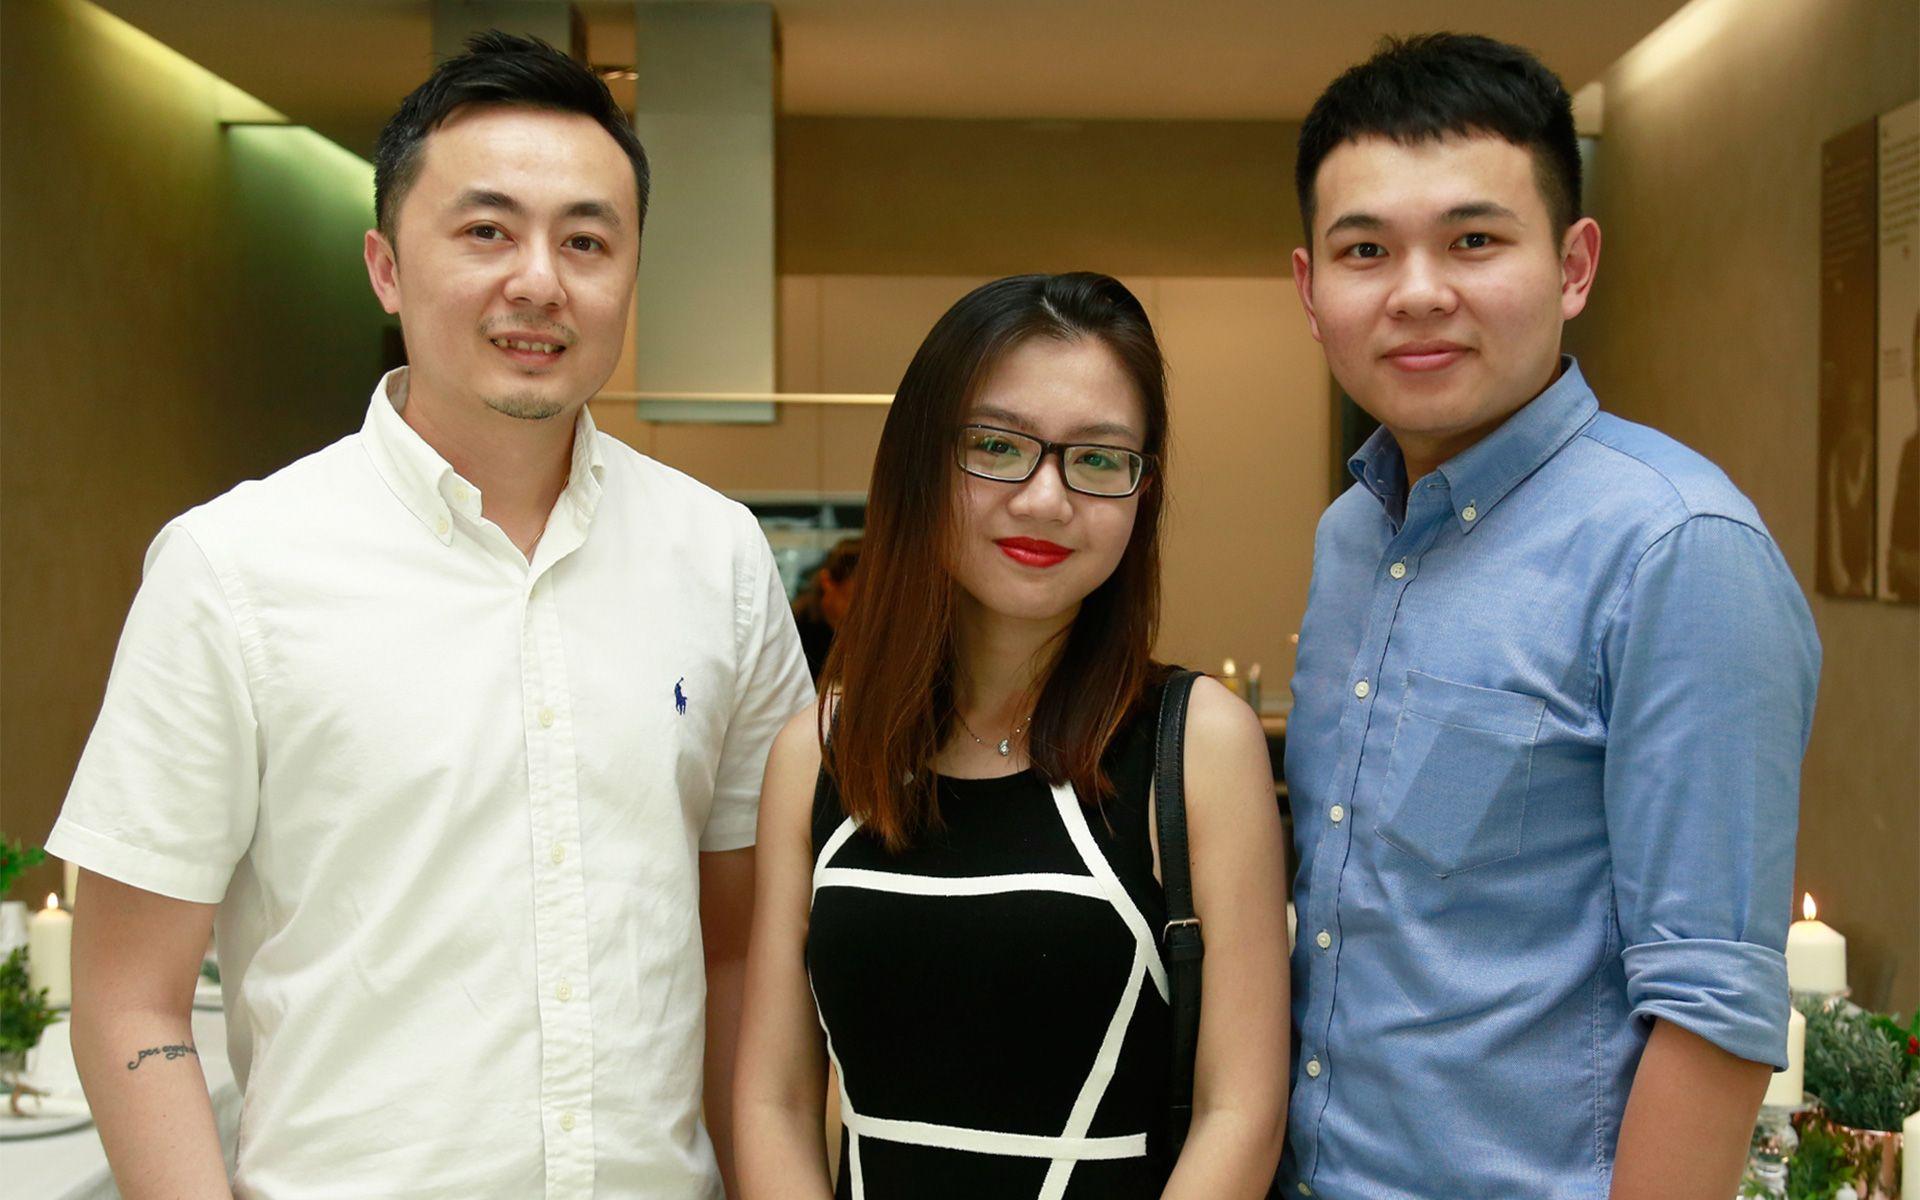 Anson Lim, Racheal Leong and Marcus Cheong